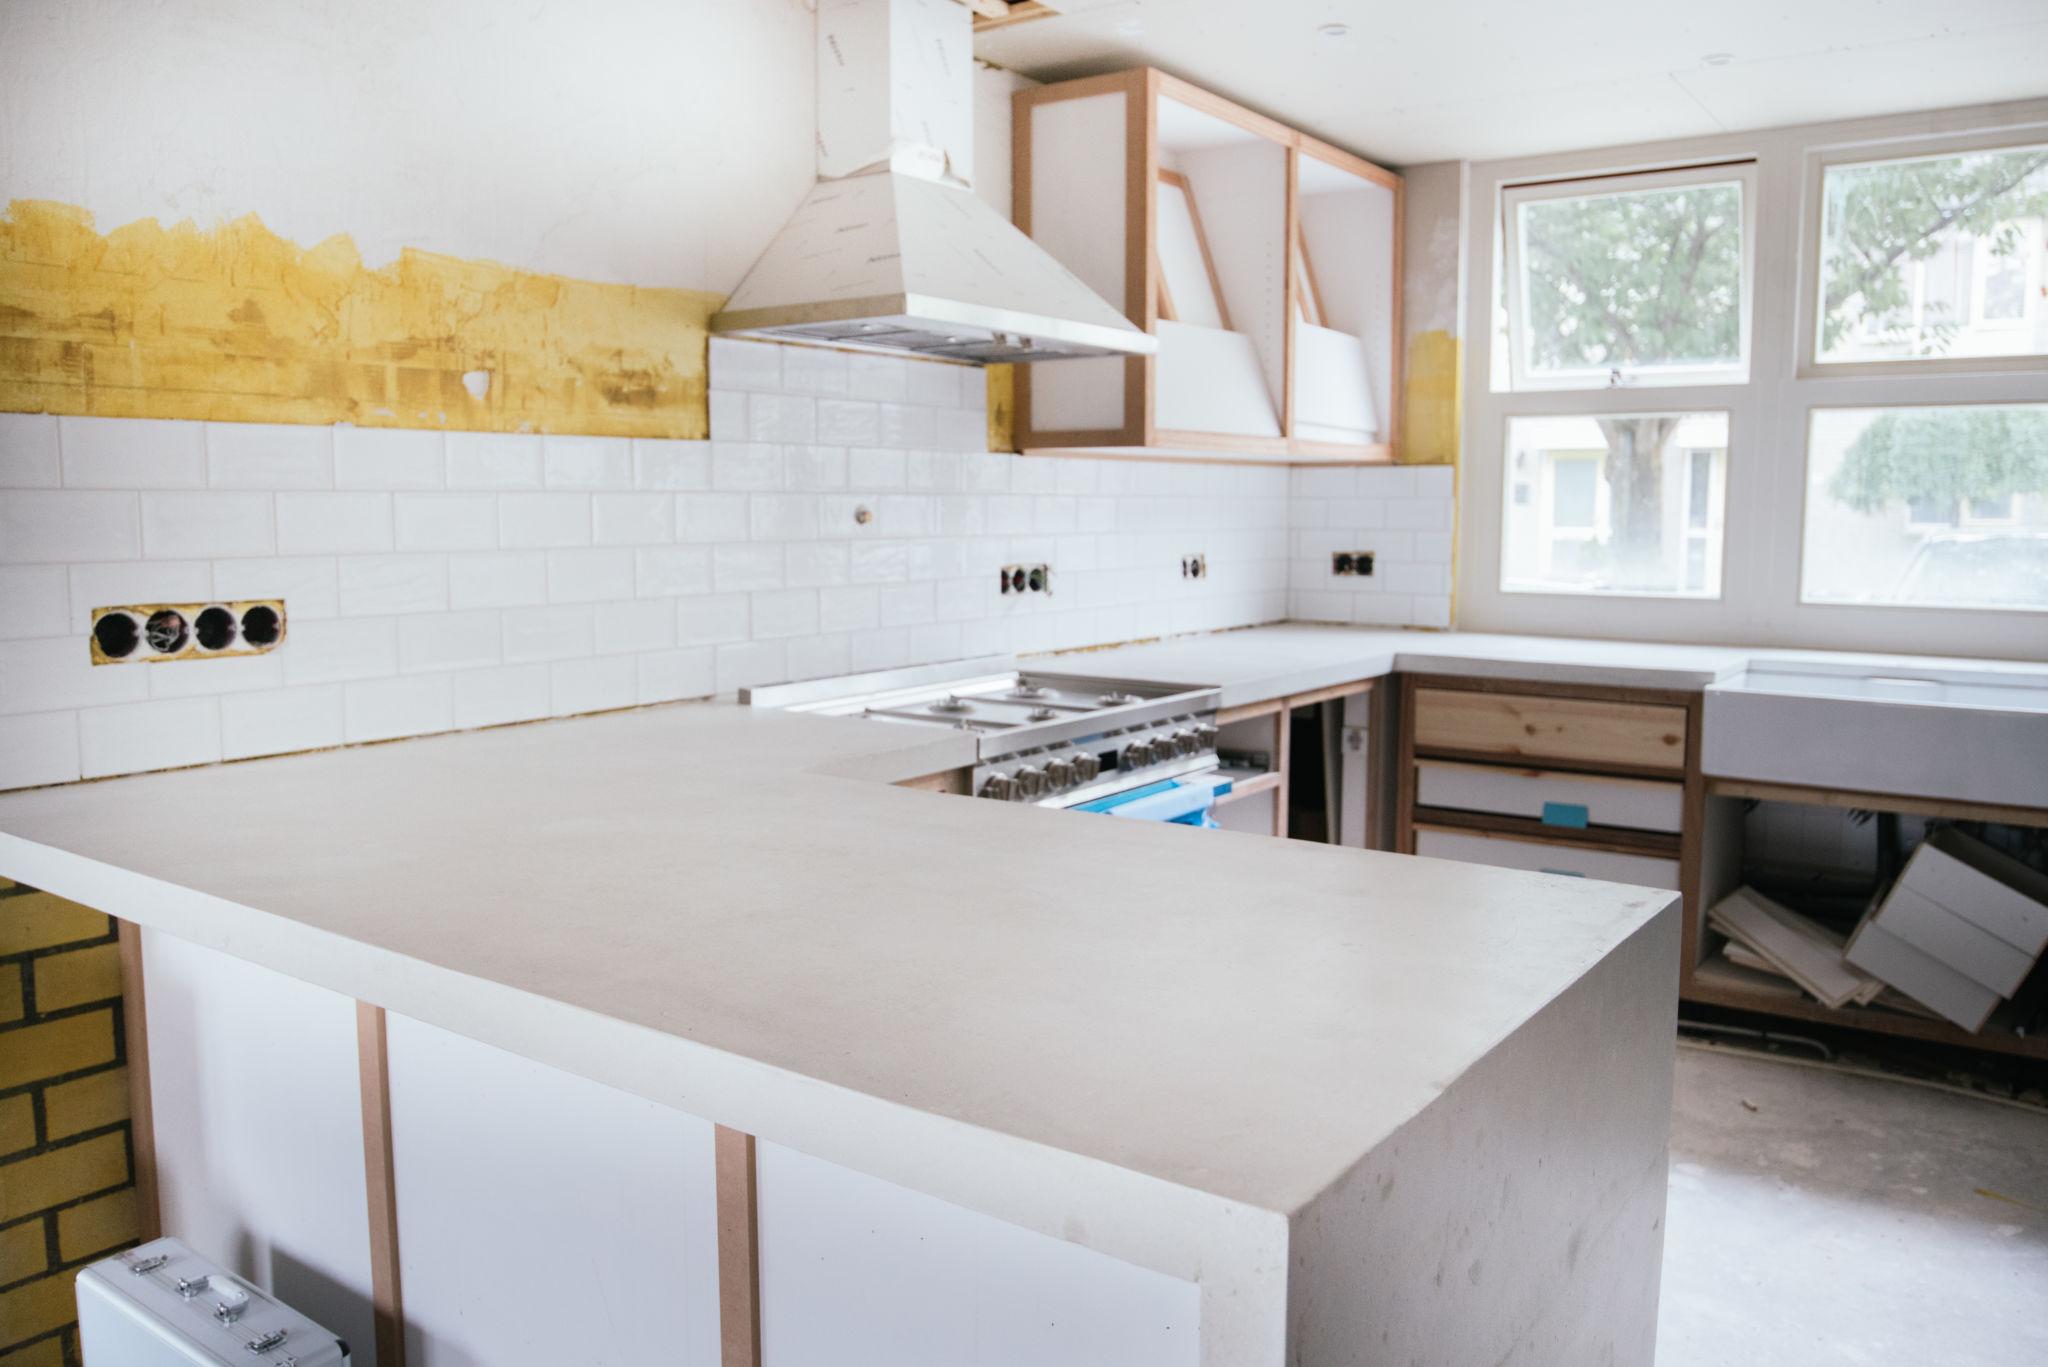 Hoe verf je je keuken blauw a cup of life for Zelf je keuken ontwerpen